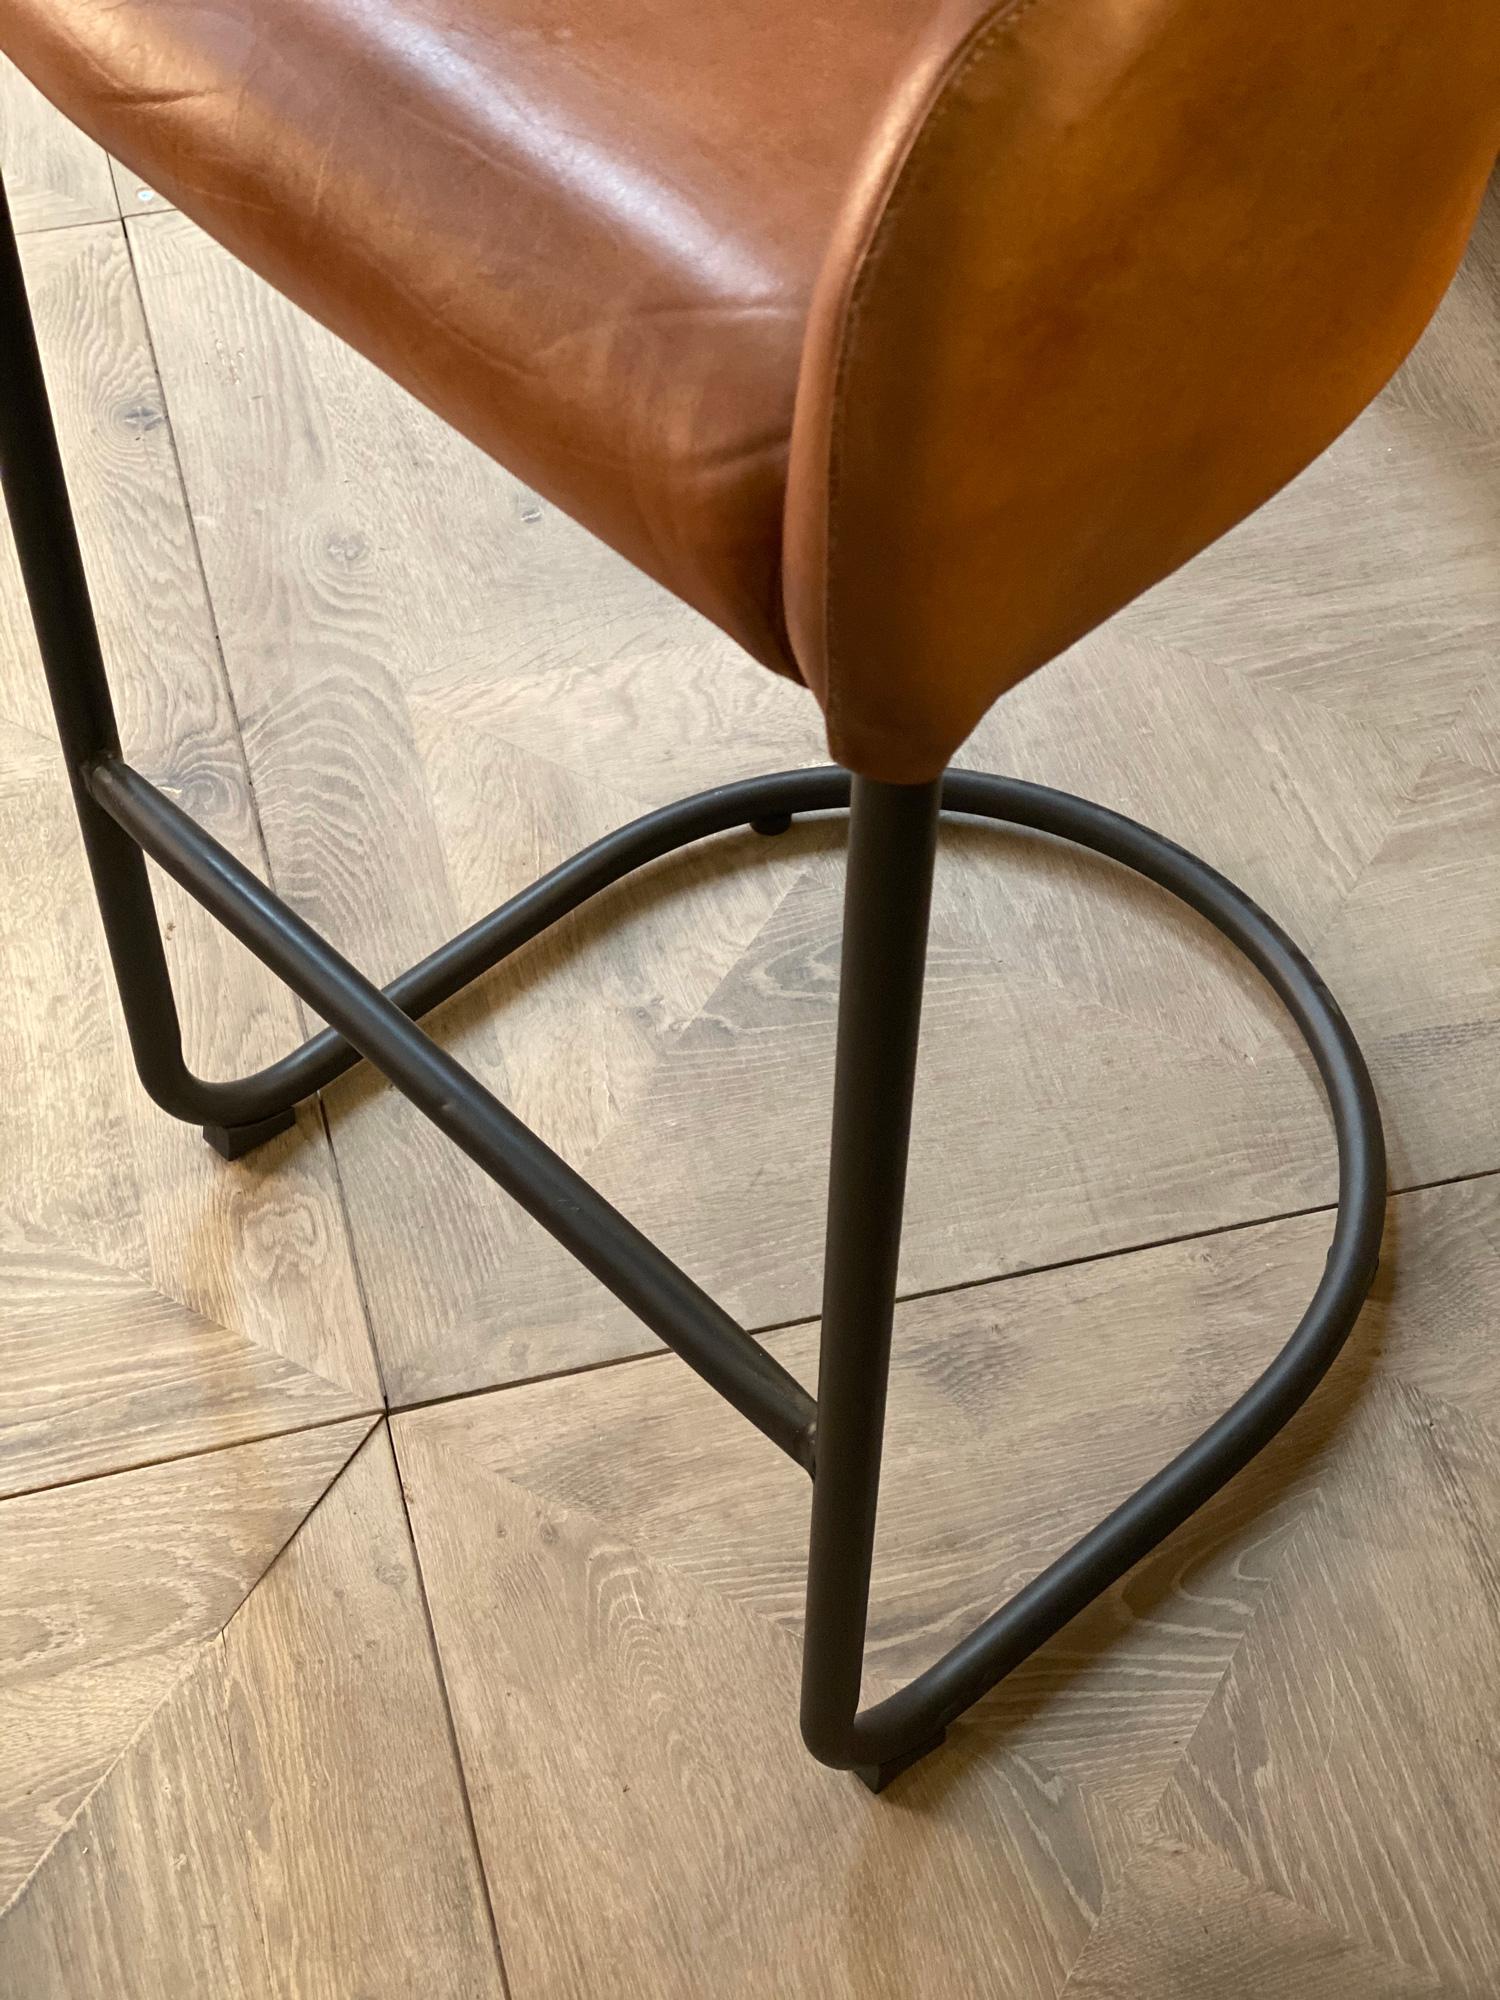 Powder coated black metal bar stool legs